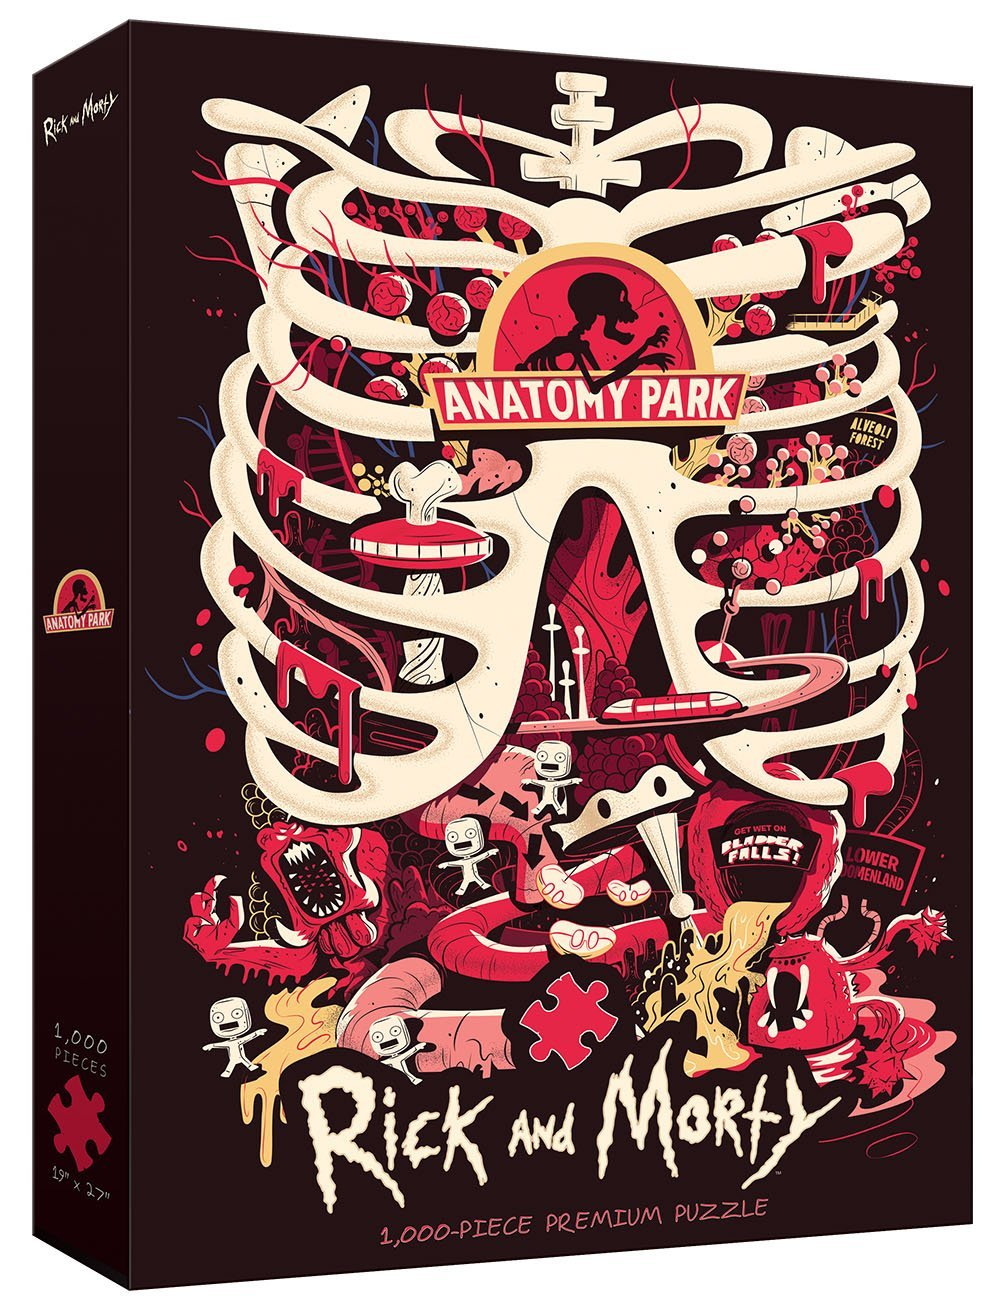 Rick and Morty Anatomy Park 1000 Piece Jigsaw Puzzle 700304048998 | eBay